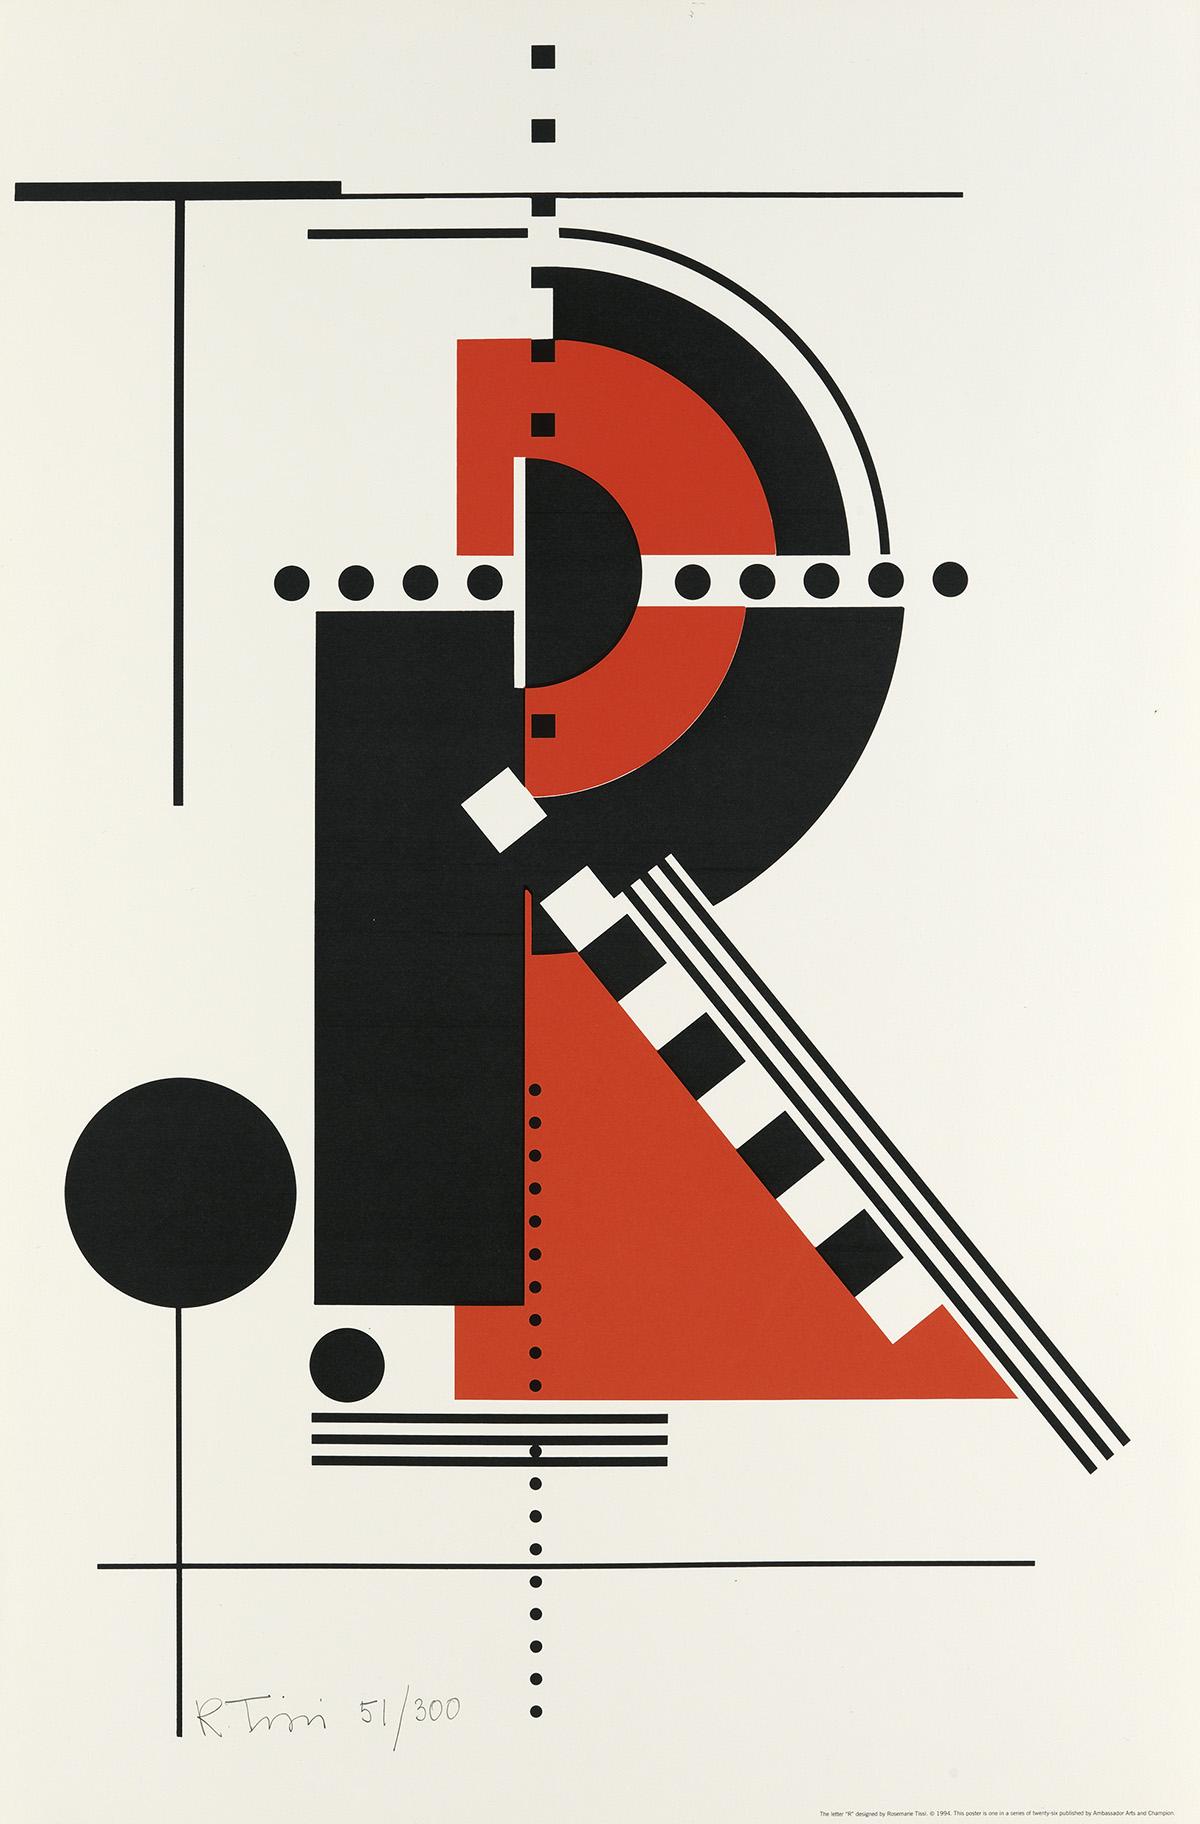 VARIOUS-ARTISTS-THE-ALPHABET-Portfolio-of-26-plates-1993-199